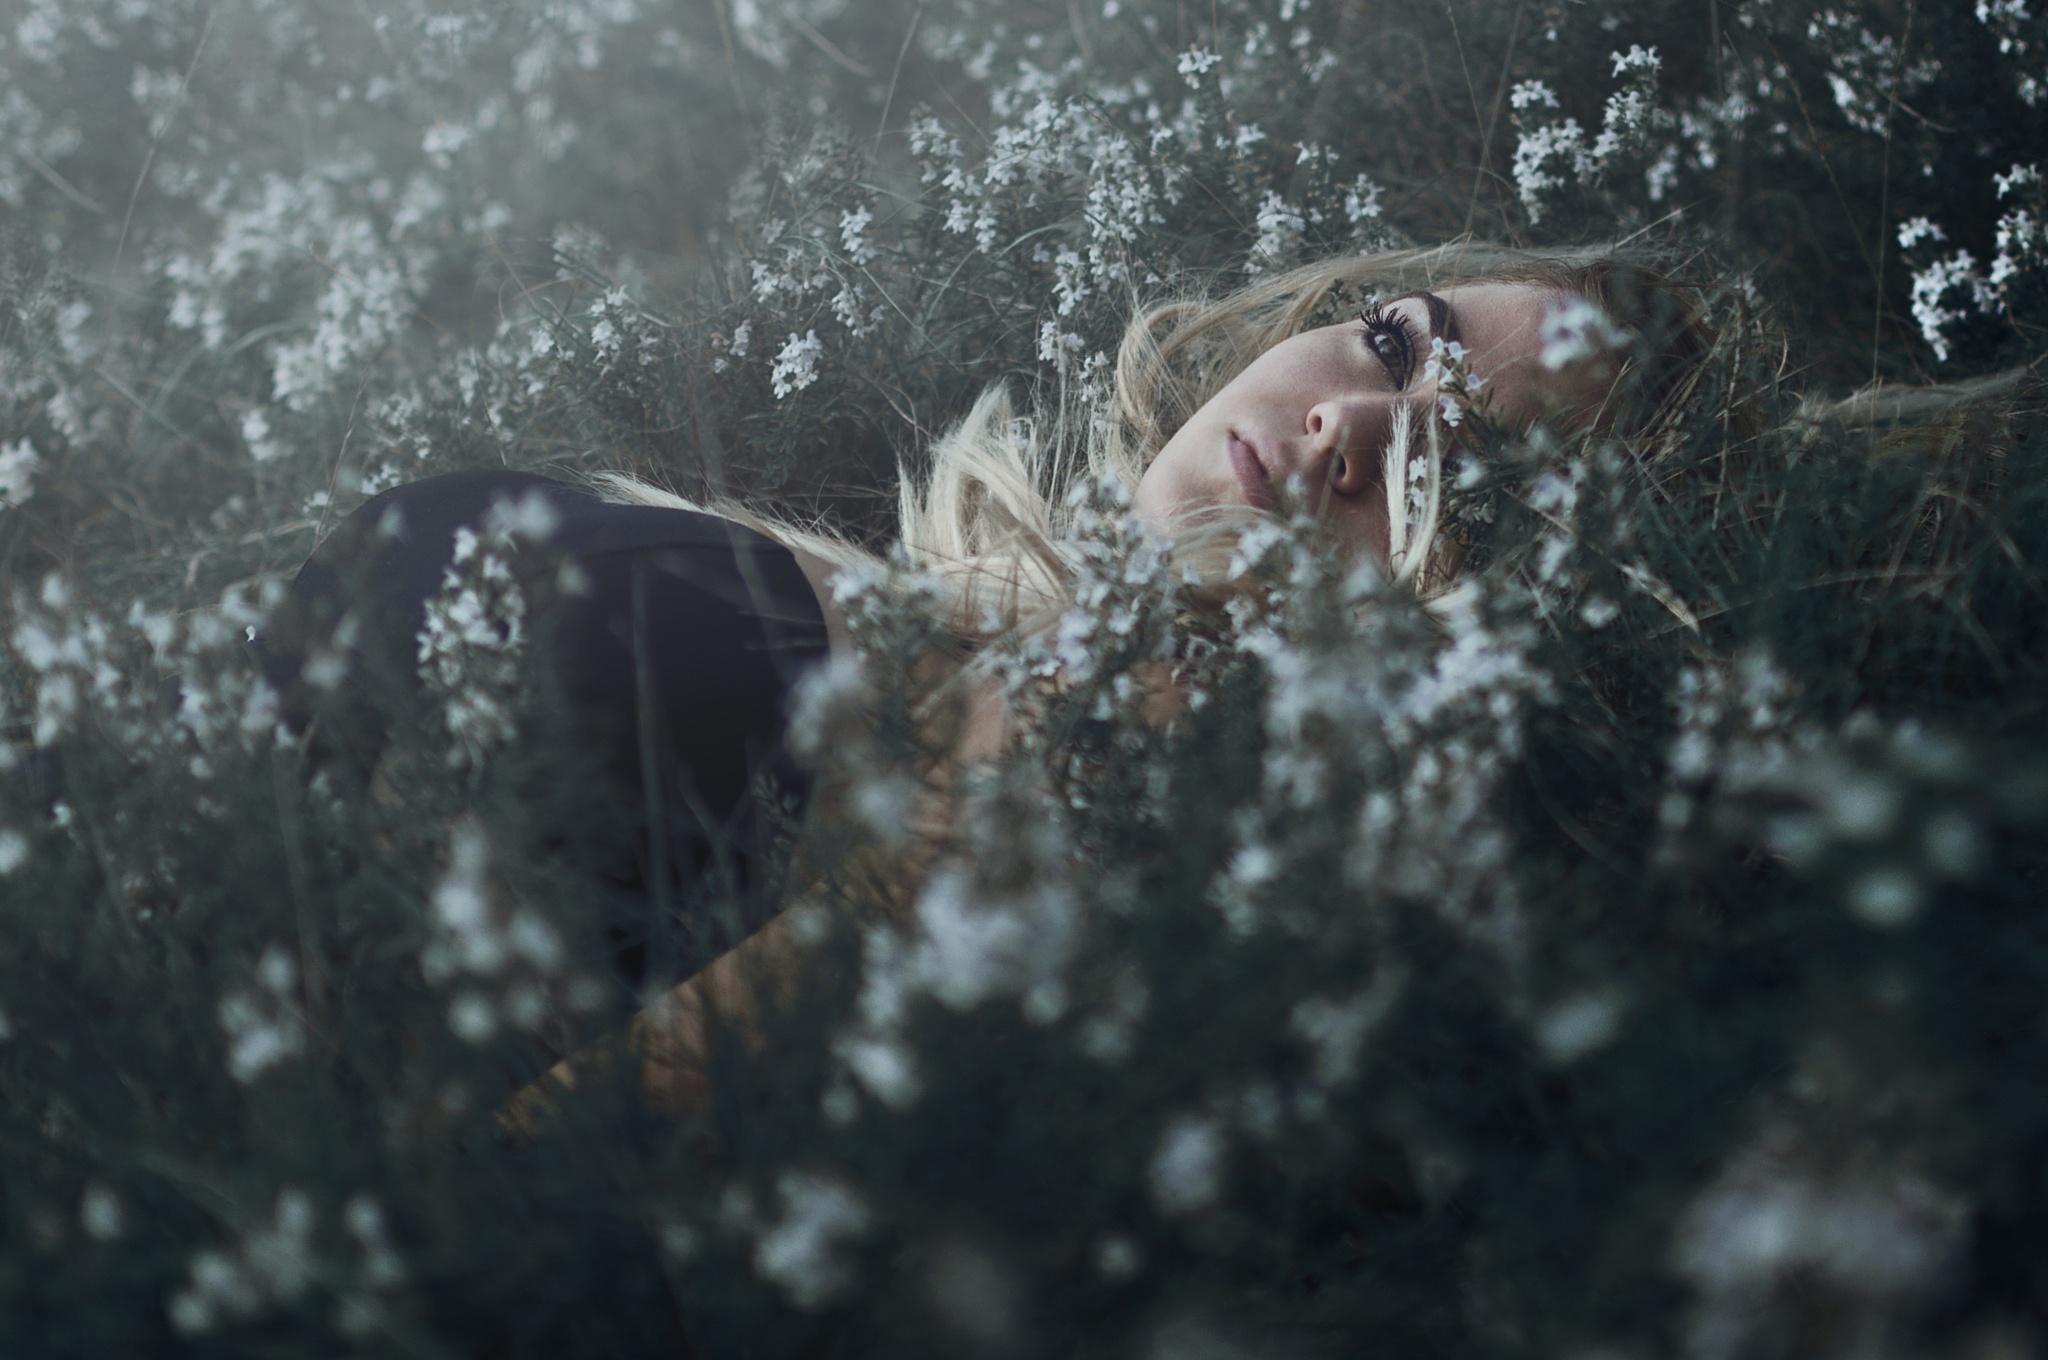 36/52 Dreaming by Federico Sciuca